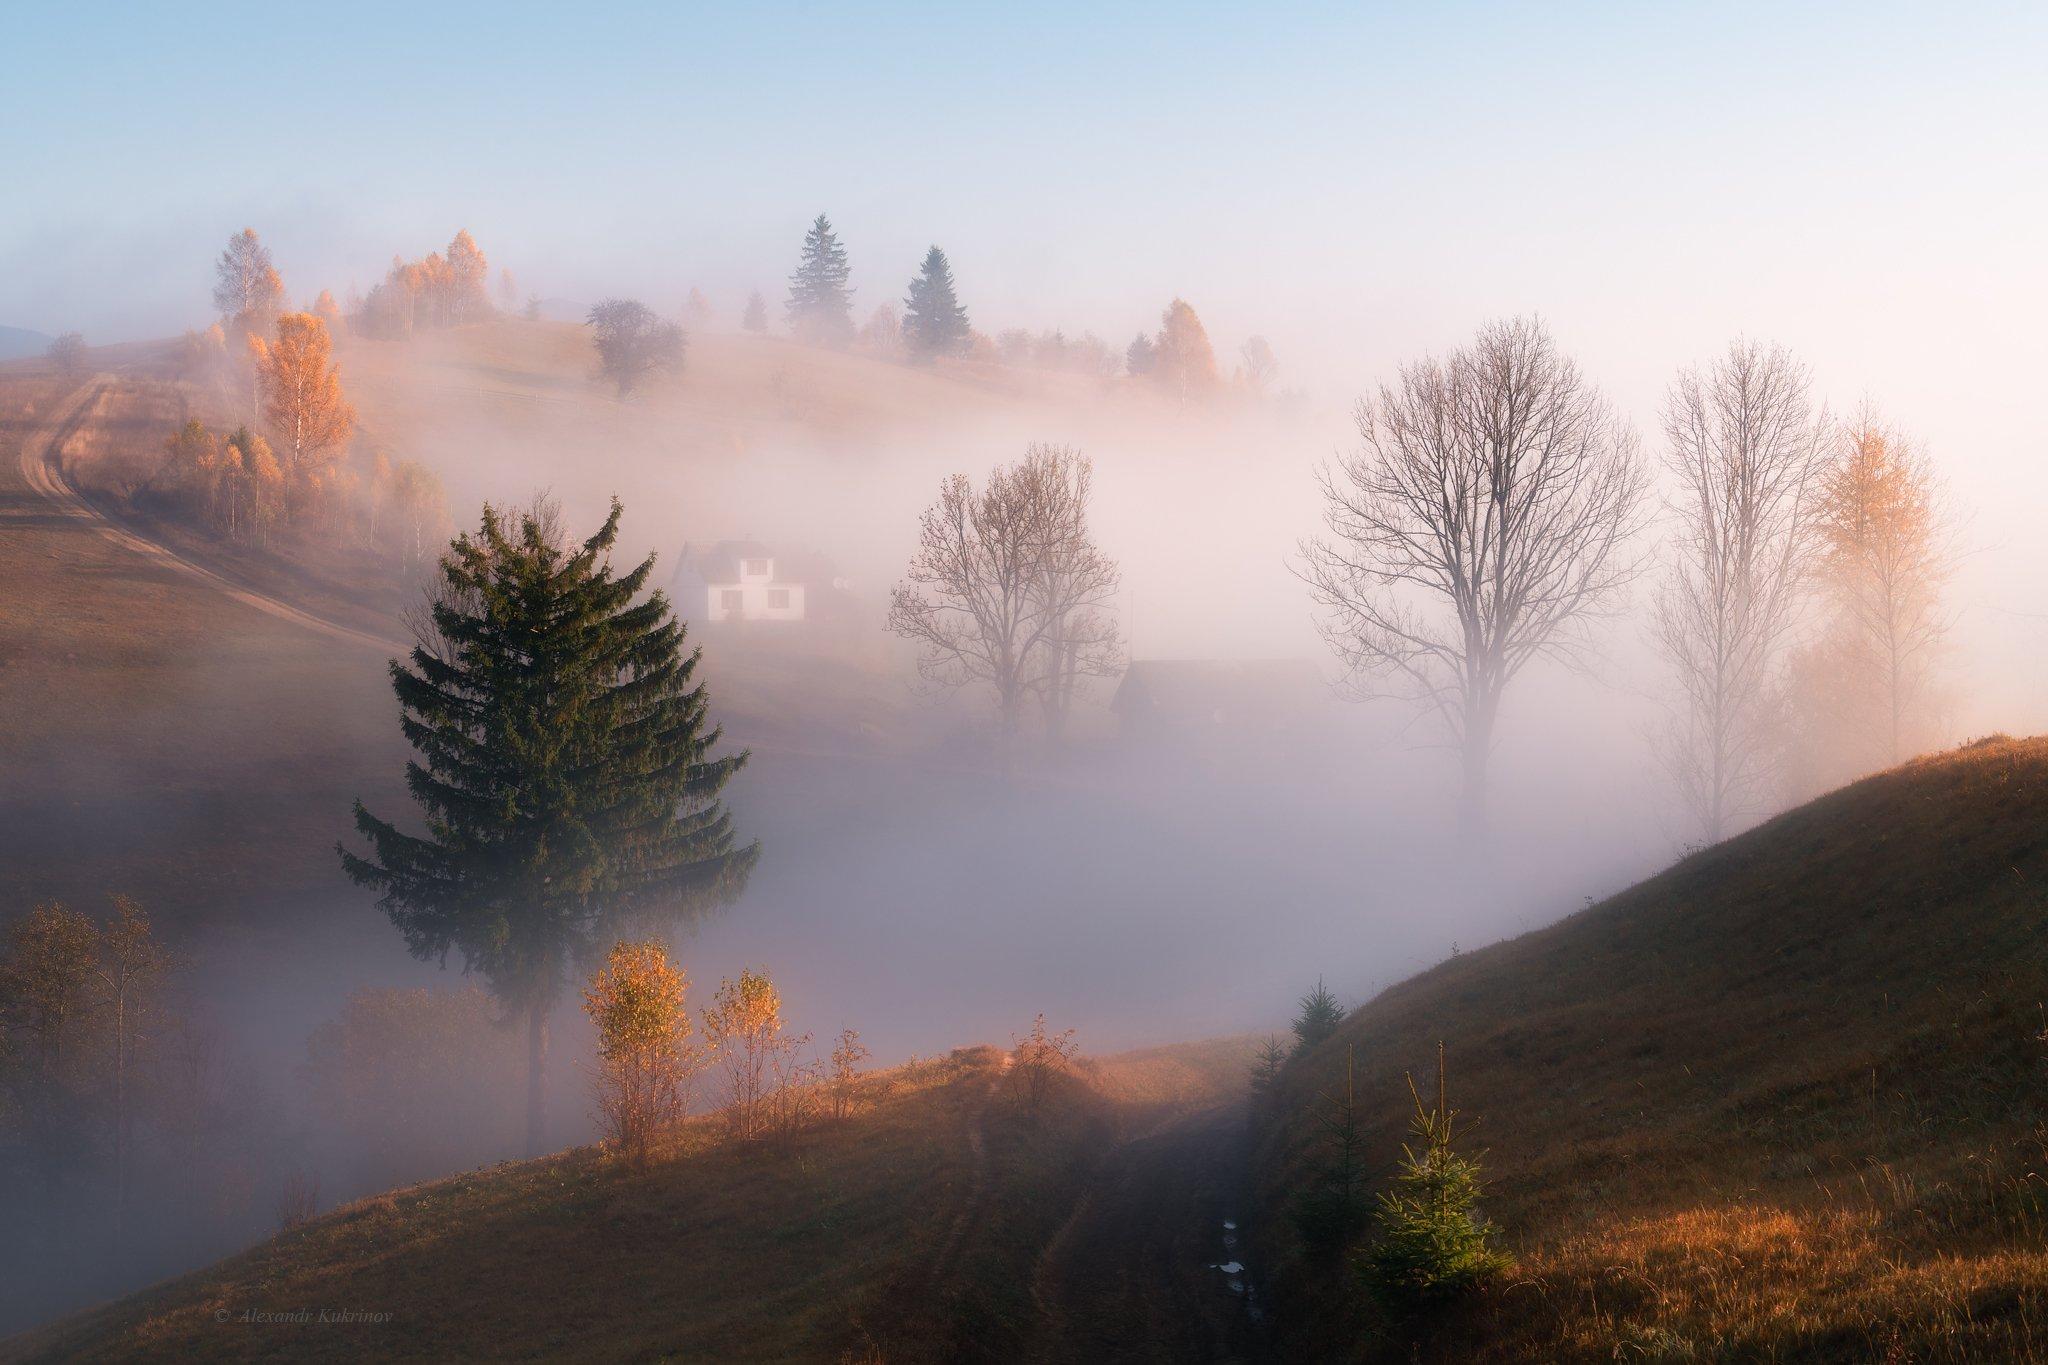 карпаты, осень, пейзаж, утро, рассвет, туман, Александр Кукринов